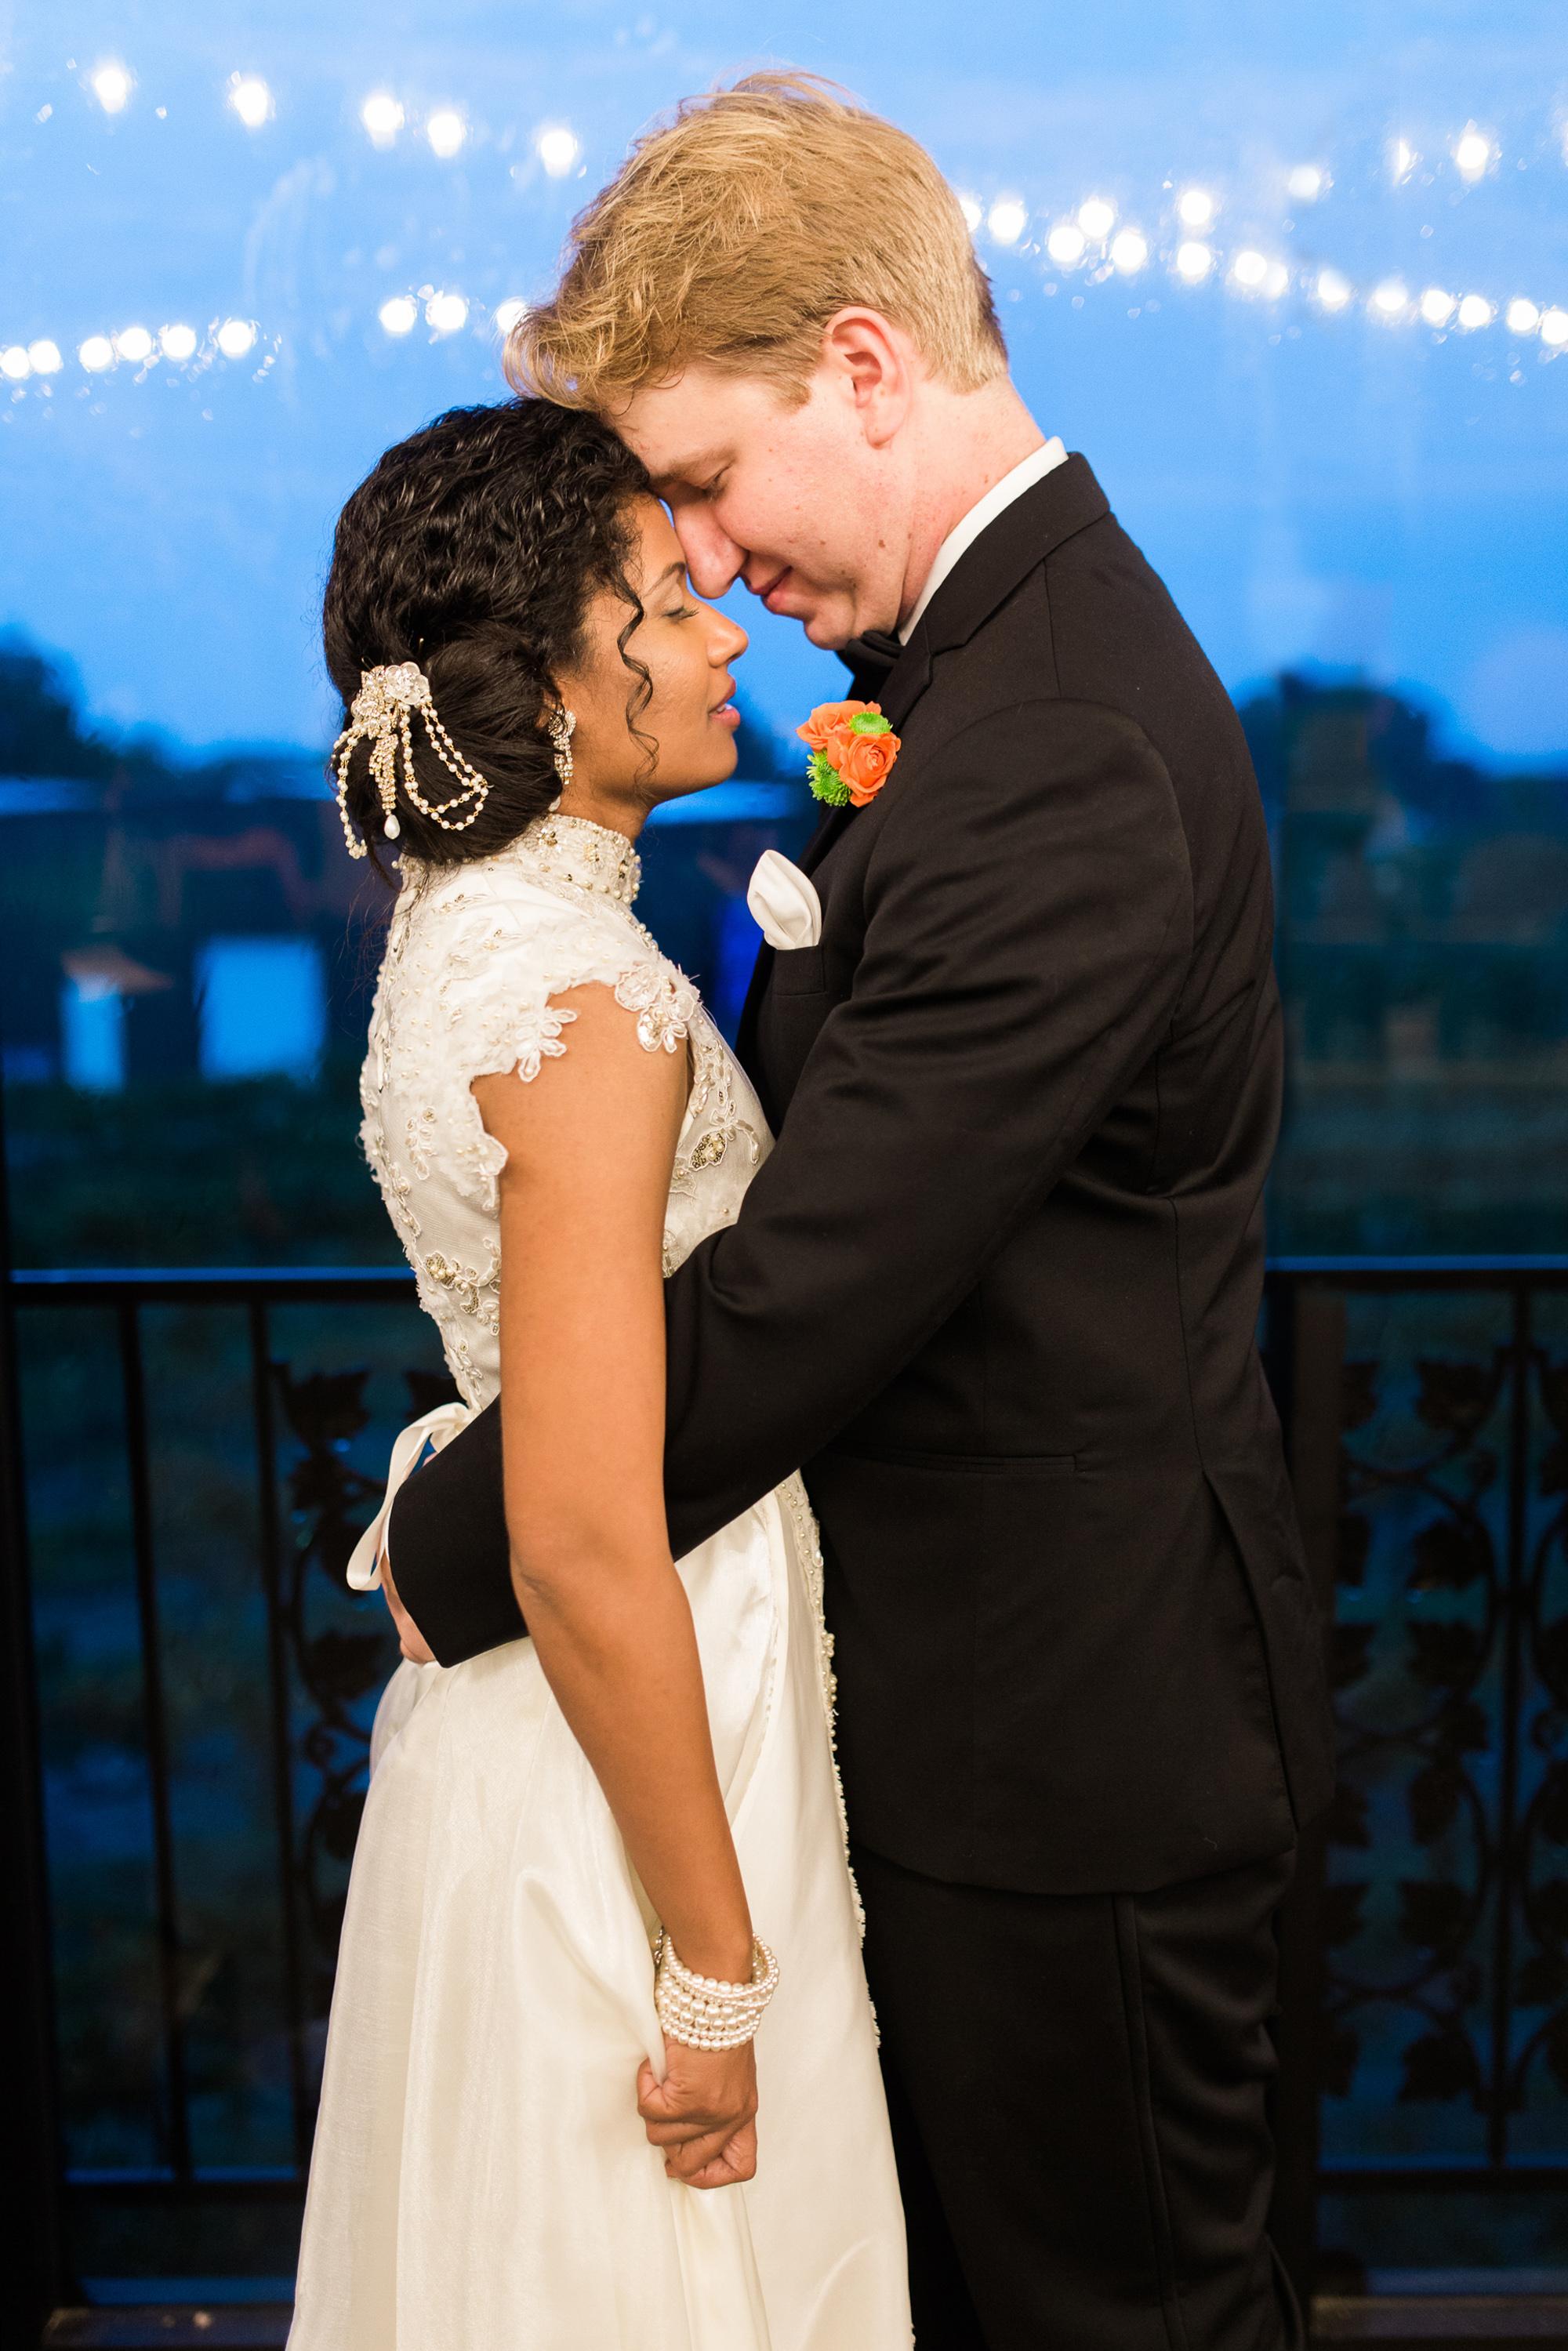 166ff-messina-hof-wedding-41messina-hof-wedding-41.jpg